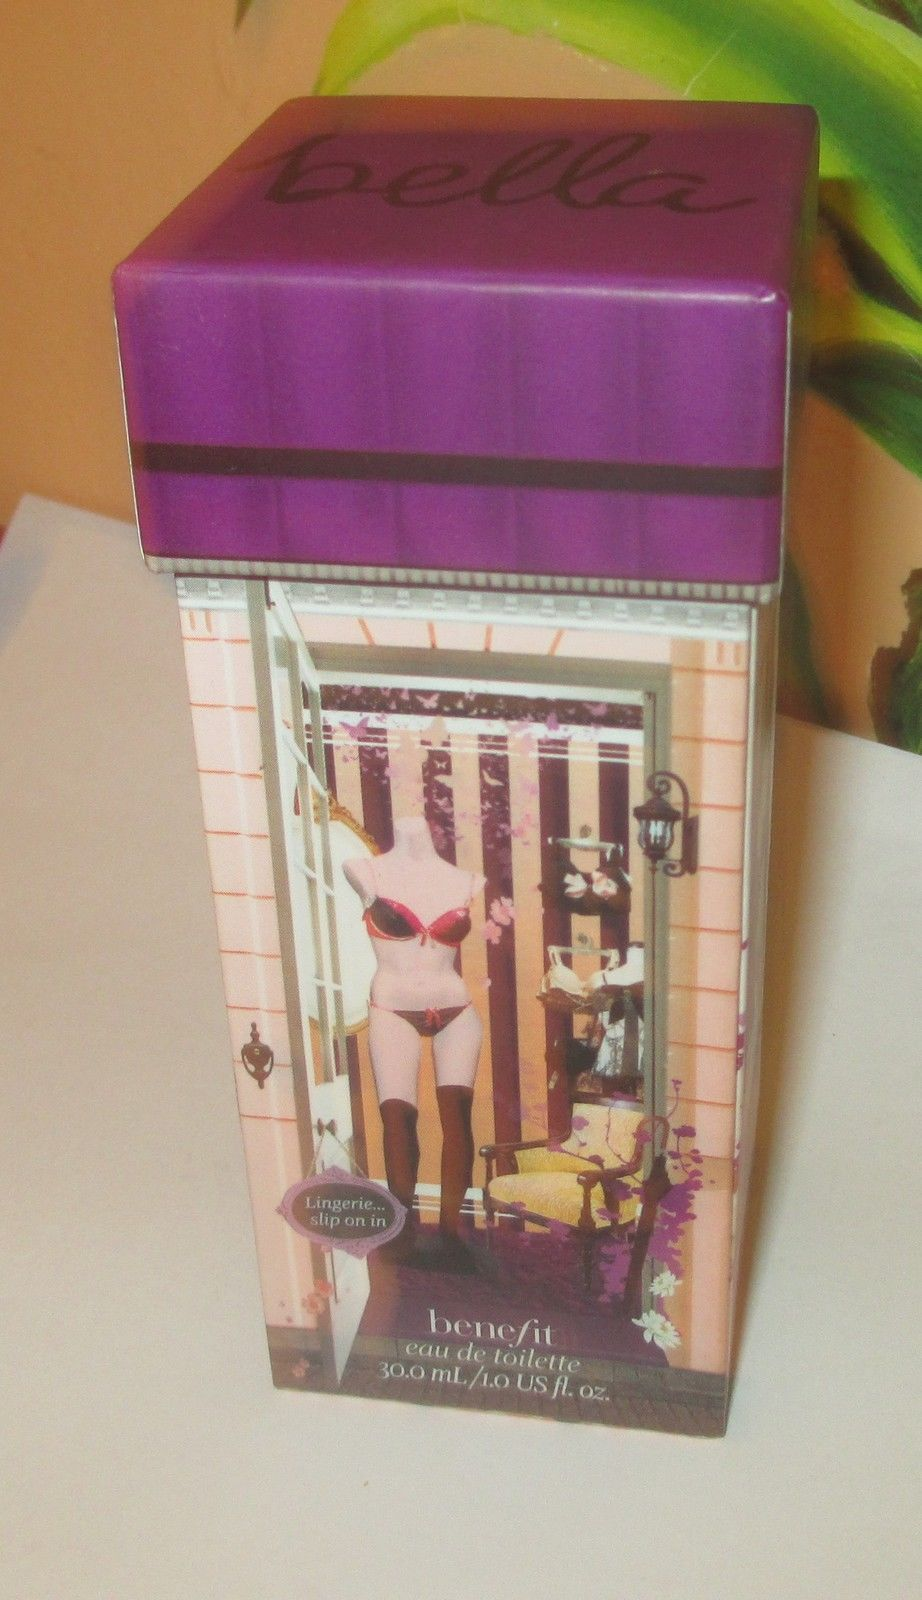 Benefit Ring My Bella 1 fl oz Eau De Toilette Spray. New In Box image 2